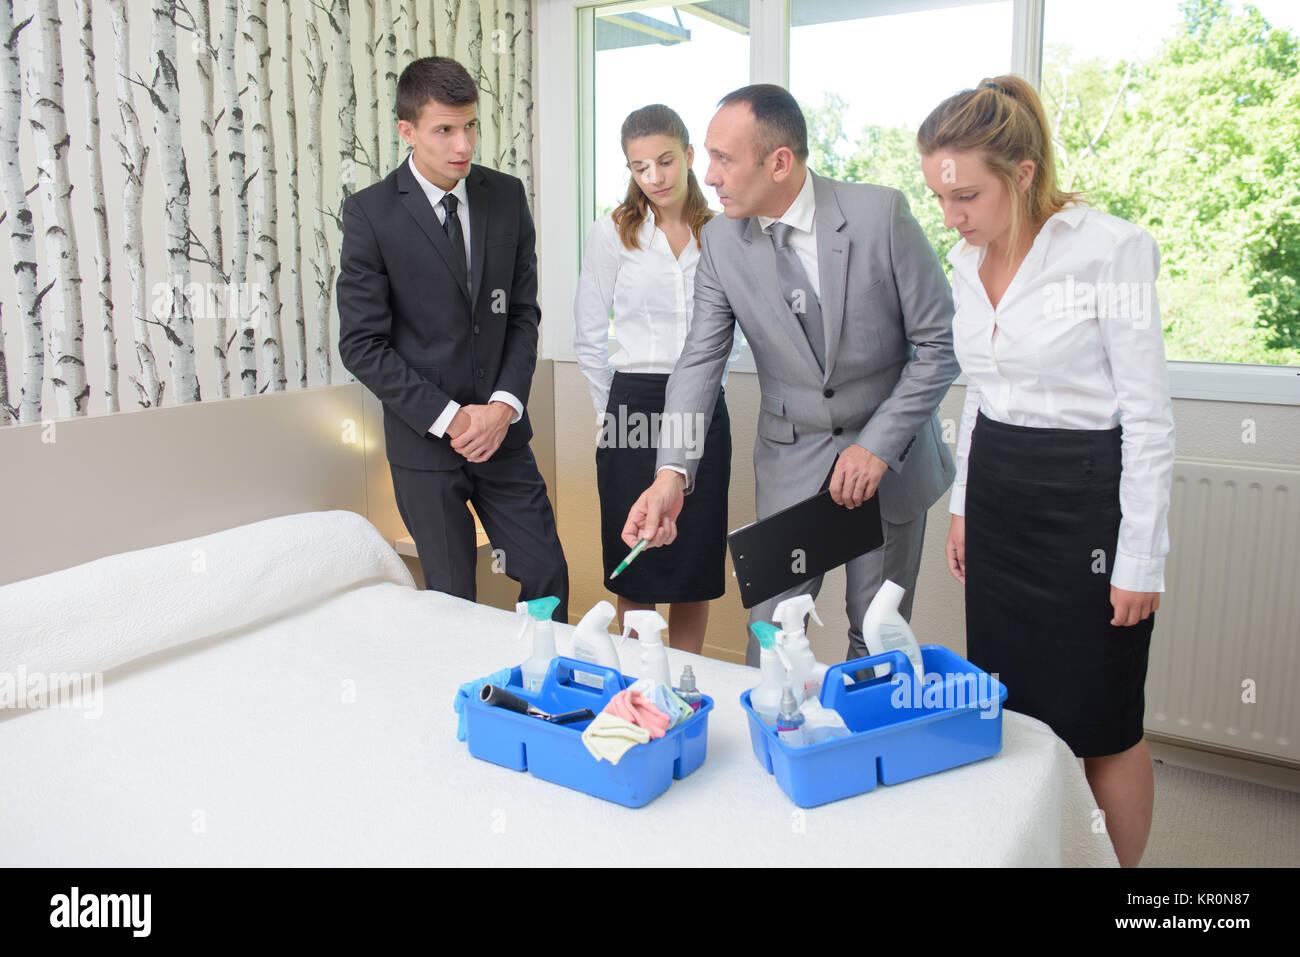 hotel room - Stock Image